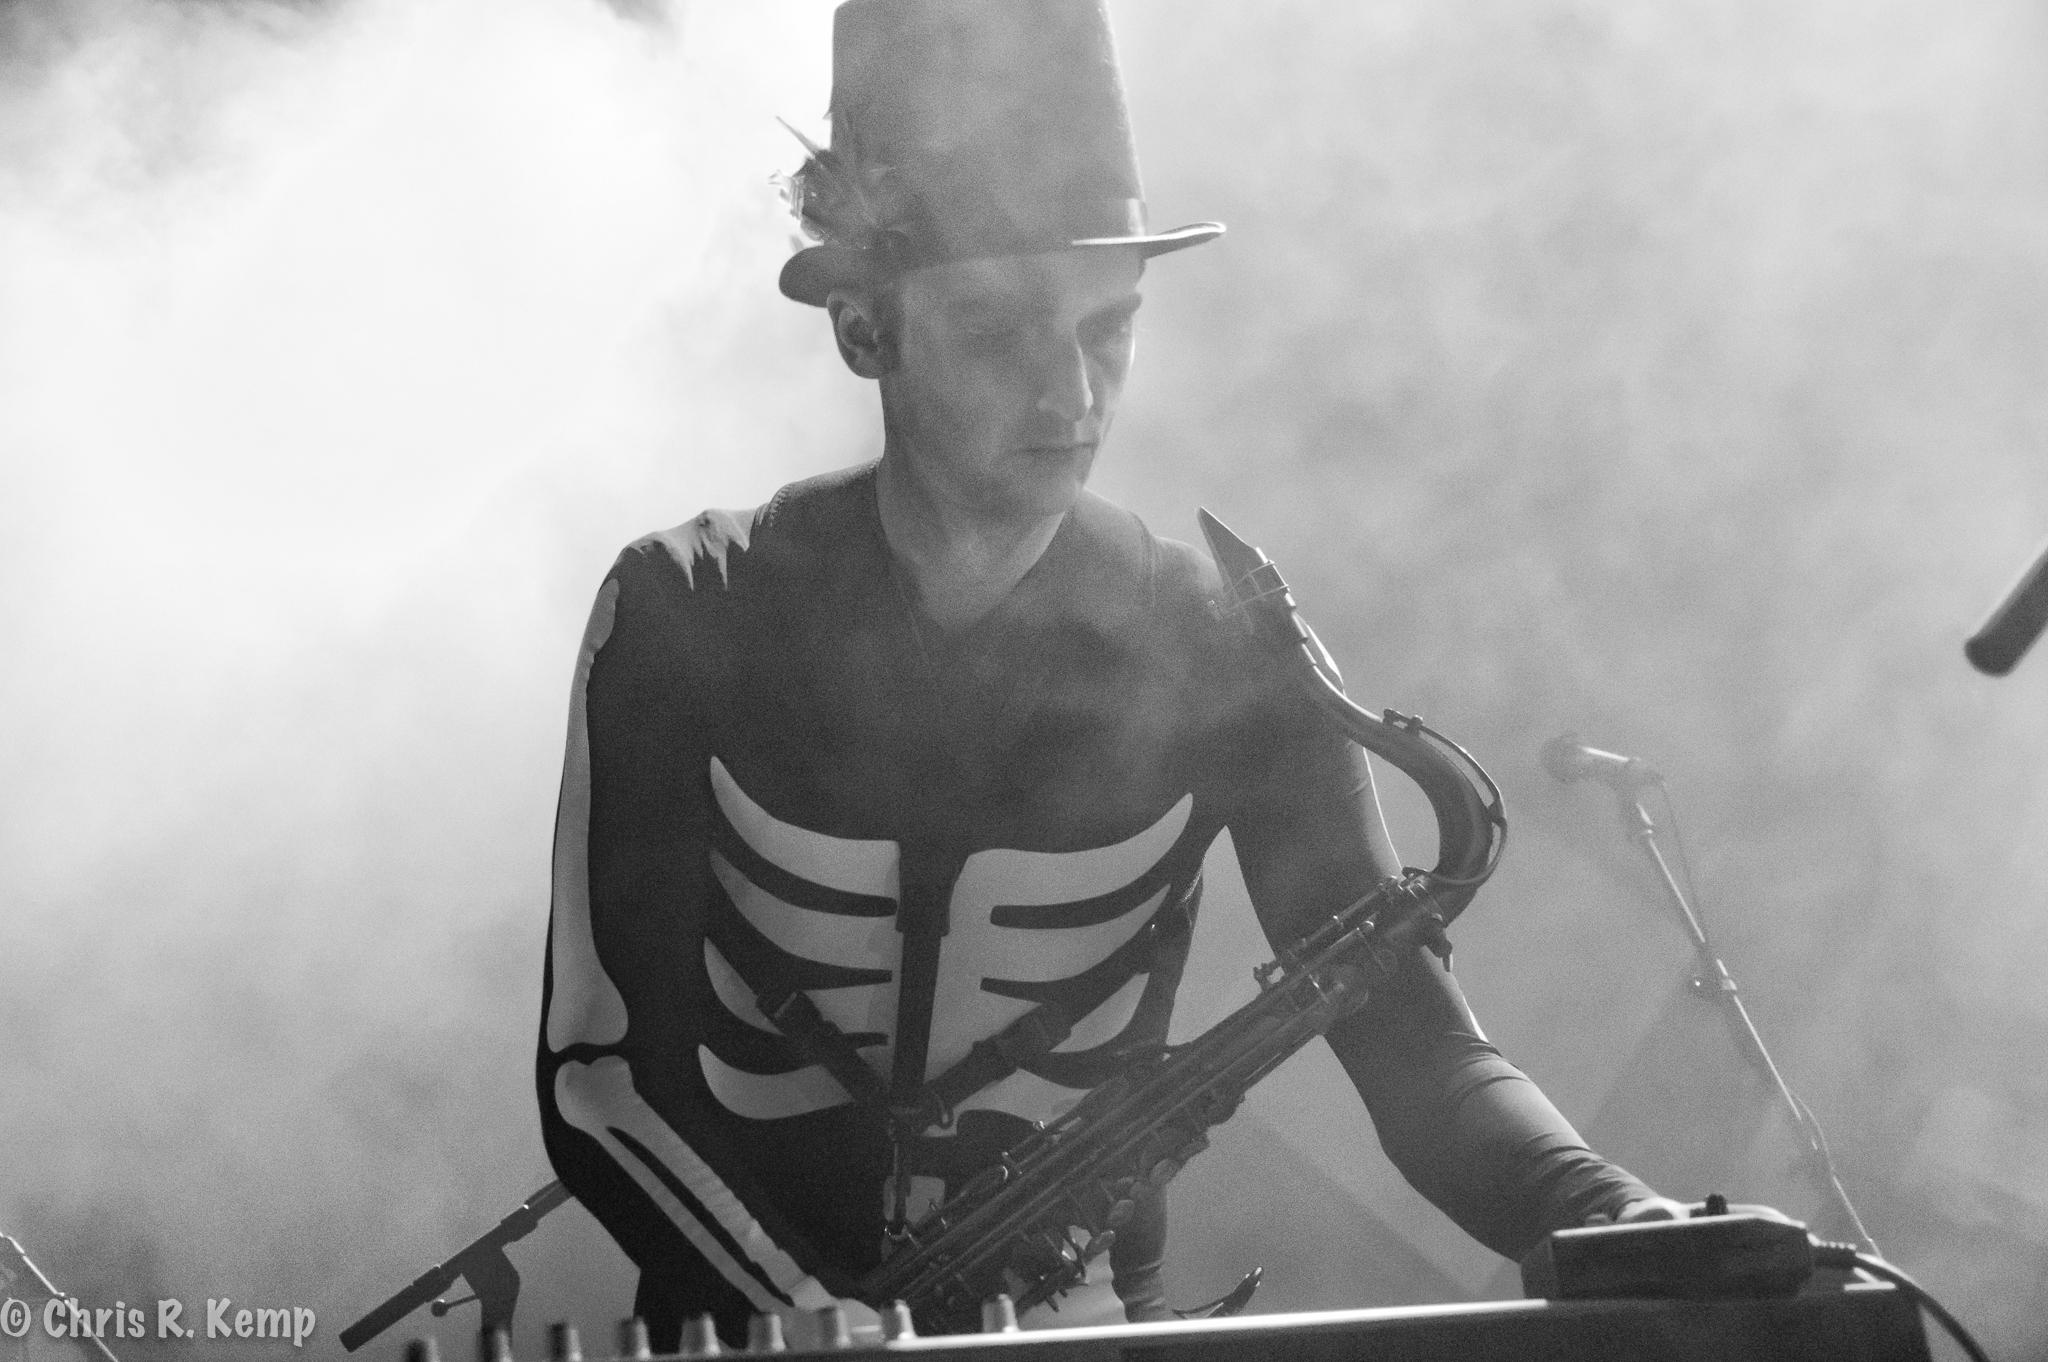 2017_Papadosio_Bouldertheater-20-Edit.jpg